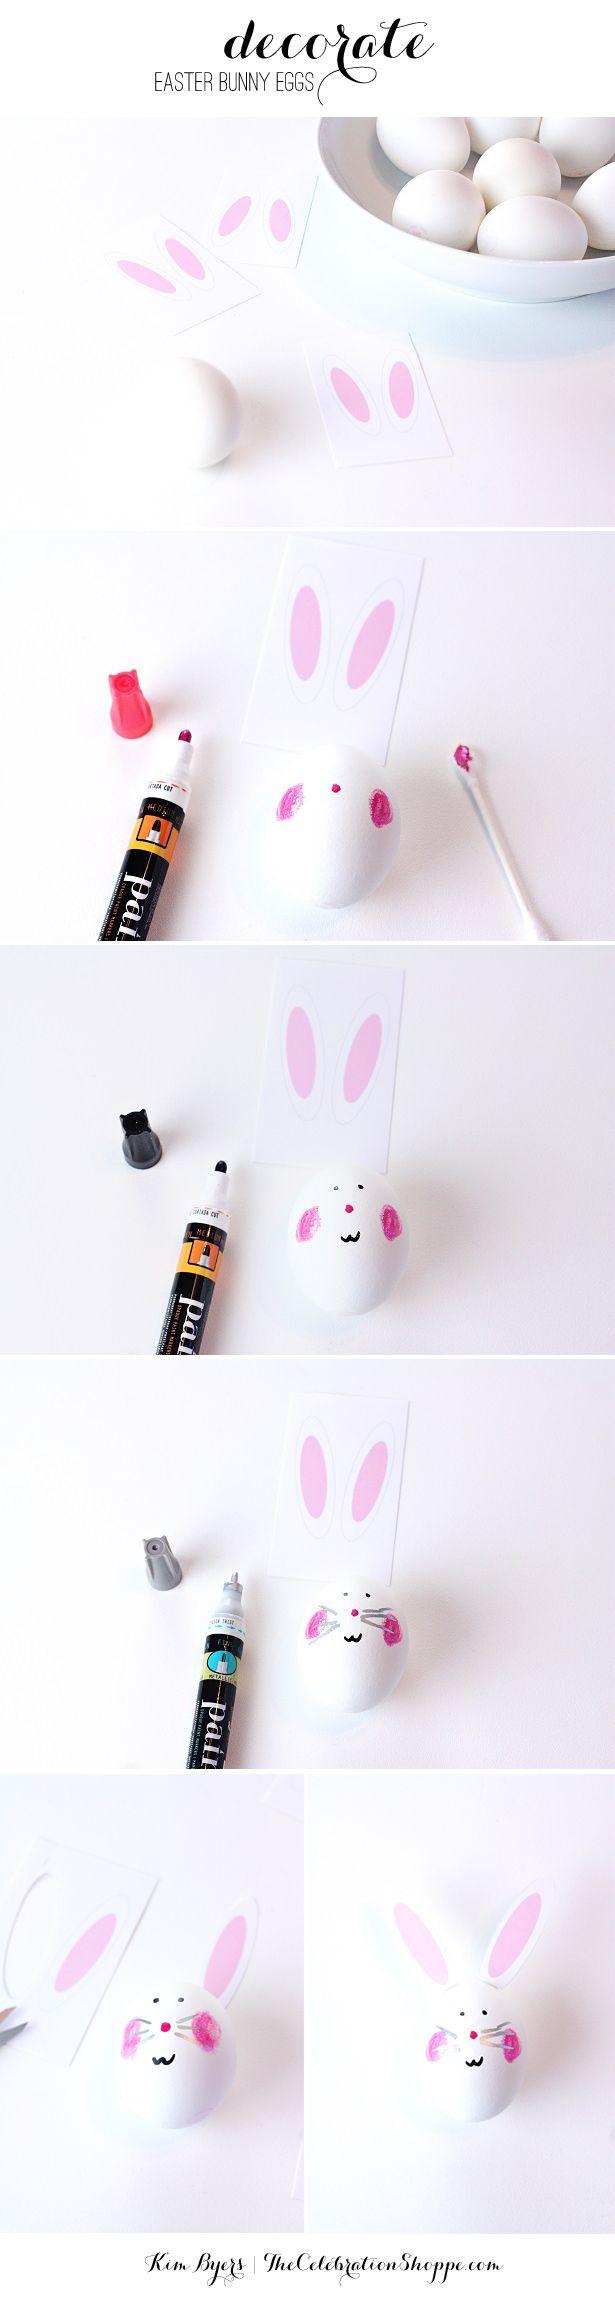 DIY Easter Egg Easter Bunnies | Decorating Easter Eggs @kimbyers TheCelebrationShoppe.com